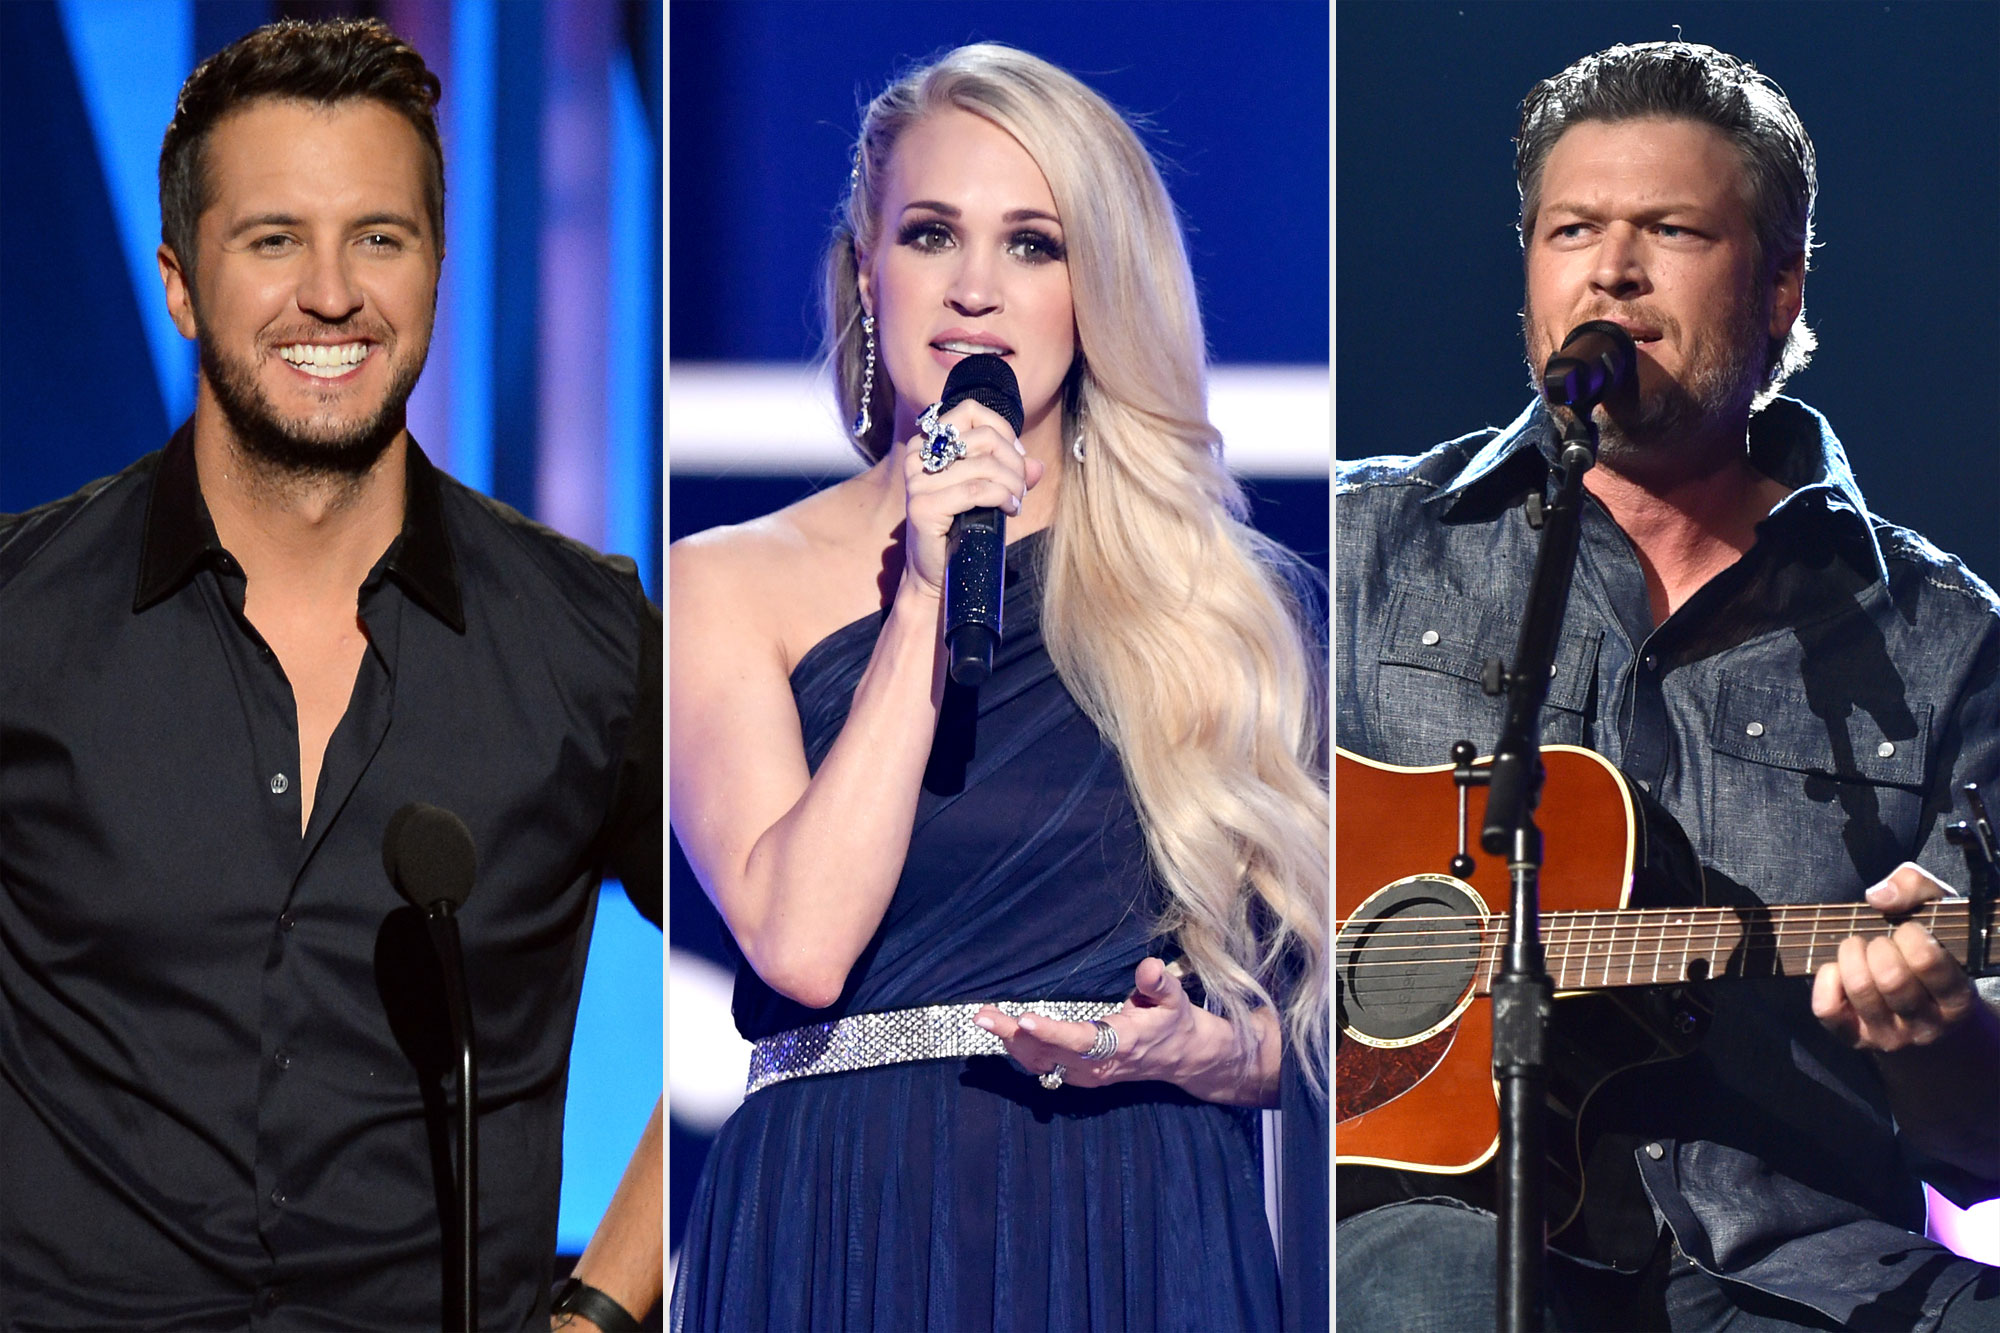 Luke Bryan, Carrie Underwood, Blake Shelton ACM replacement concert